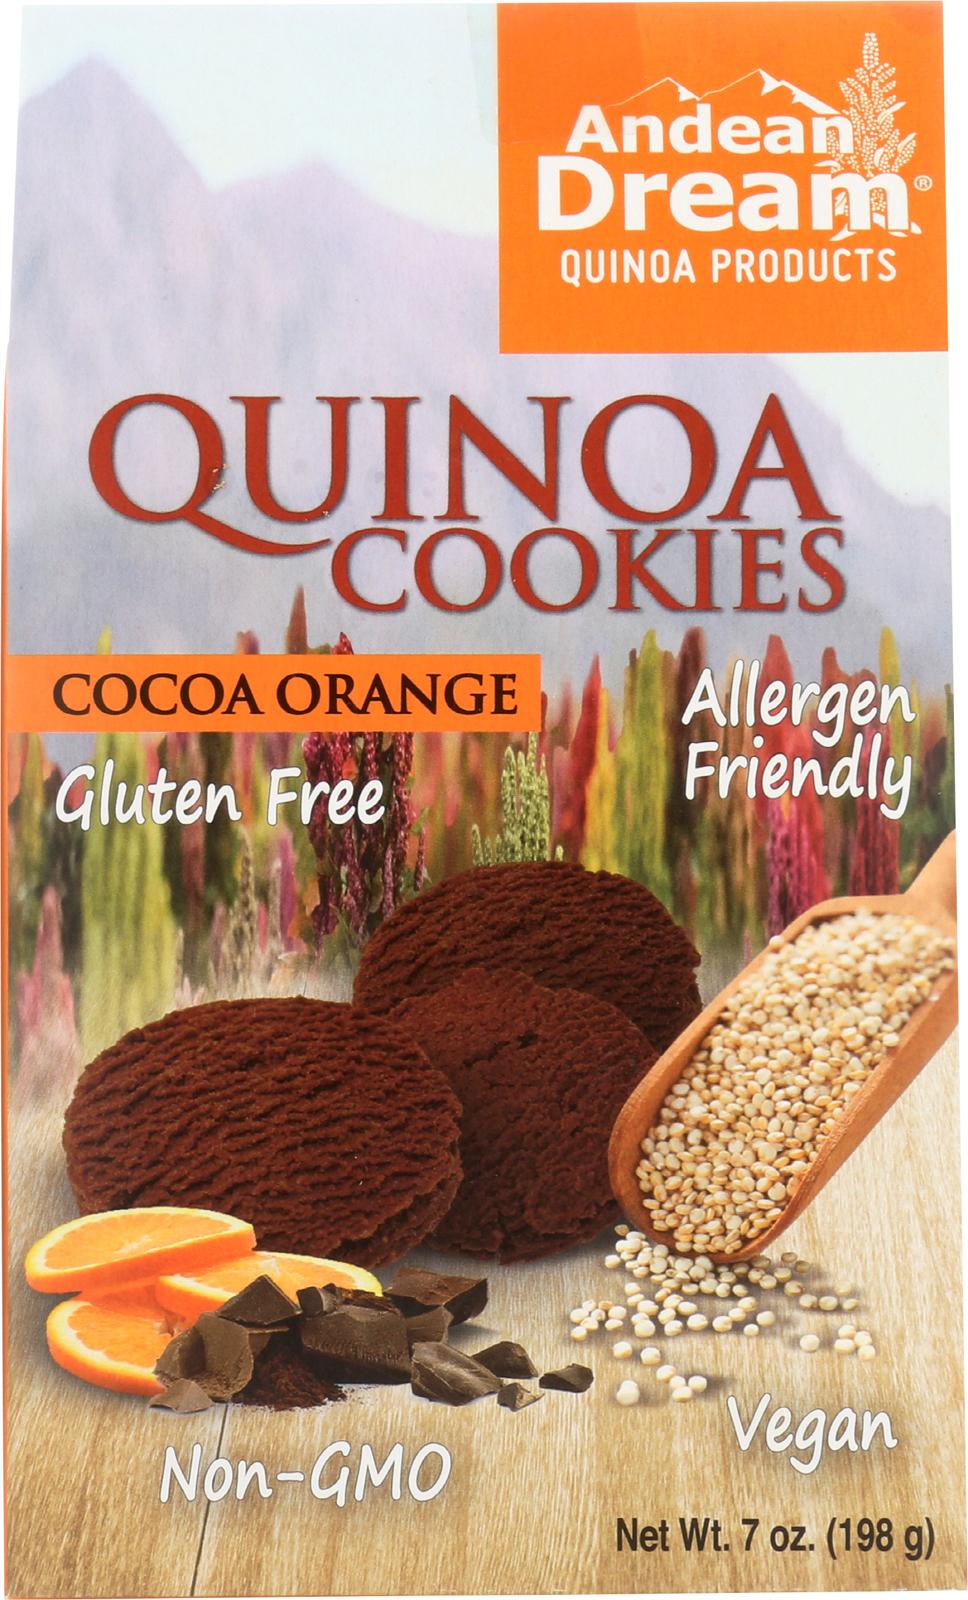 Andean Dream Gluten Free Quinoa Cookies Cocoa Orange - Case of 6 - 7 oz.